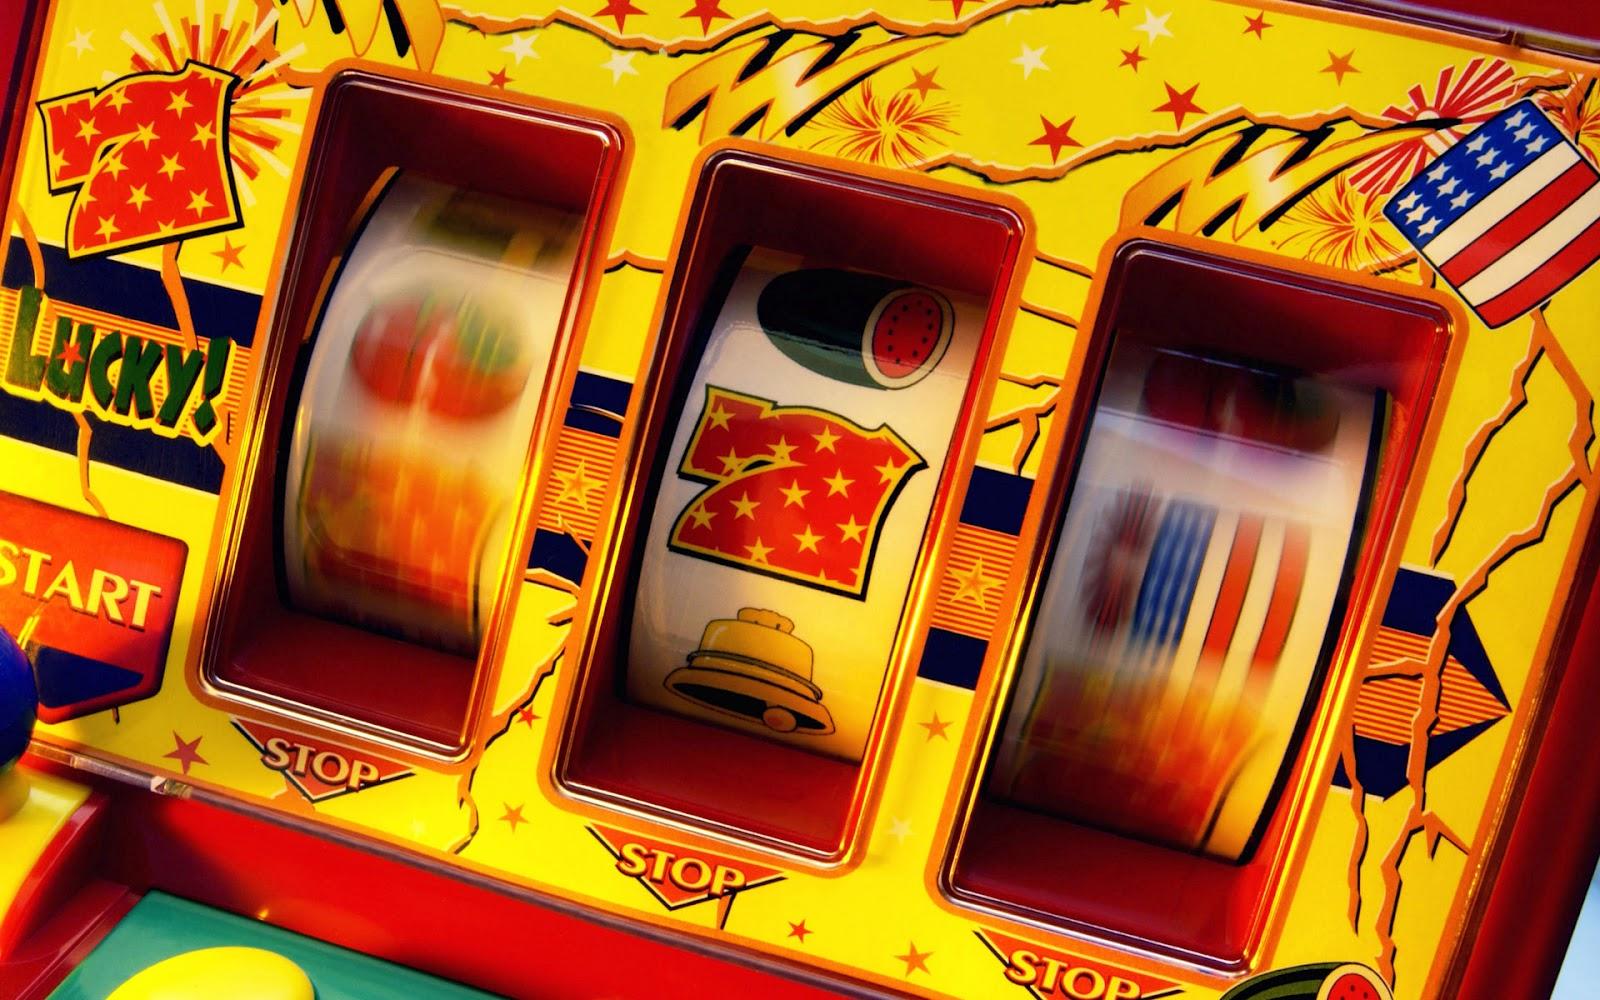 http://4.bp.blogspot.com/-qwjG6kceF0M/Ty5WlH_6KSI/AAAAAAAAMiI/0xwRMCum94U/s1600/Wallpaper+Casino+HD+-+01.bmp